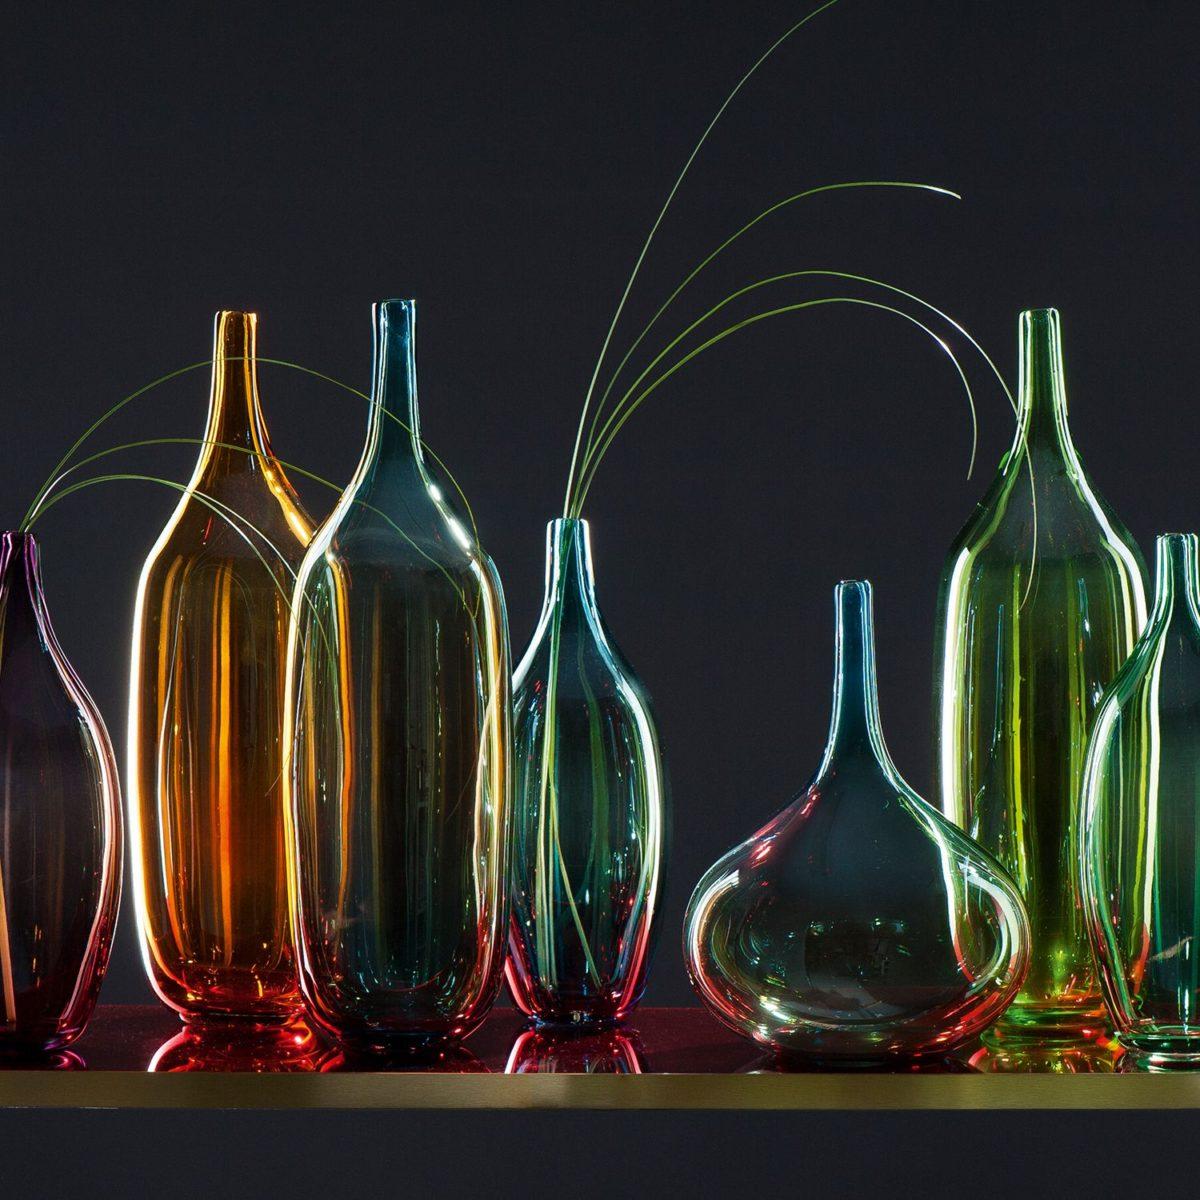 020822 1 k 2 1200x1200 - Vază luster Lucente green 32 cm (L020813)